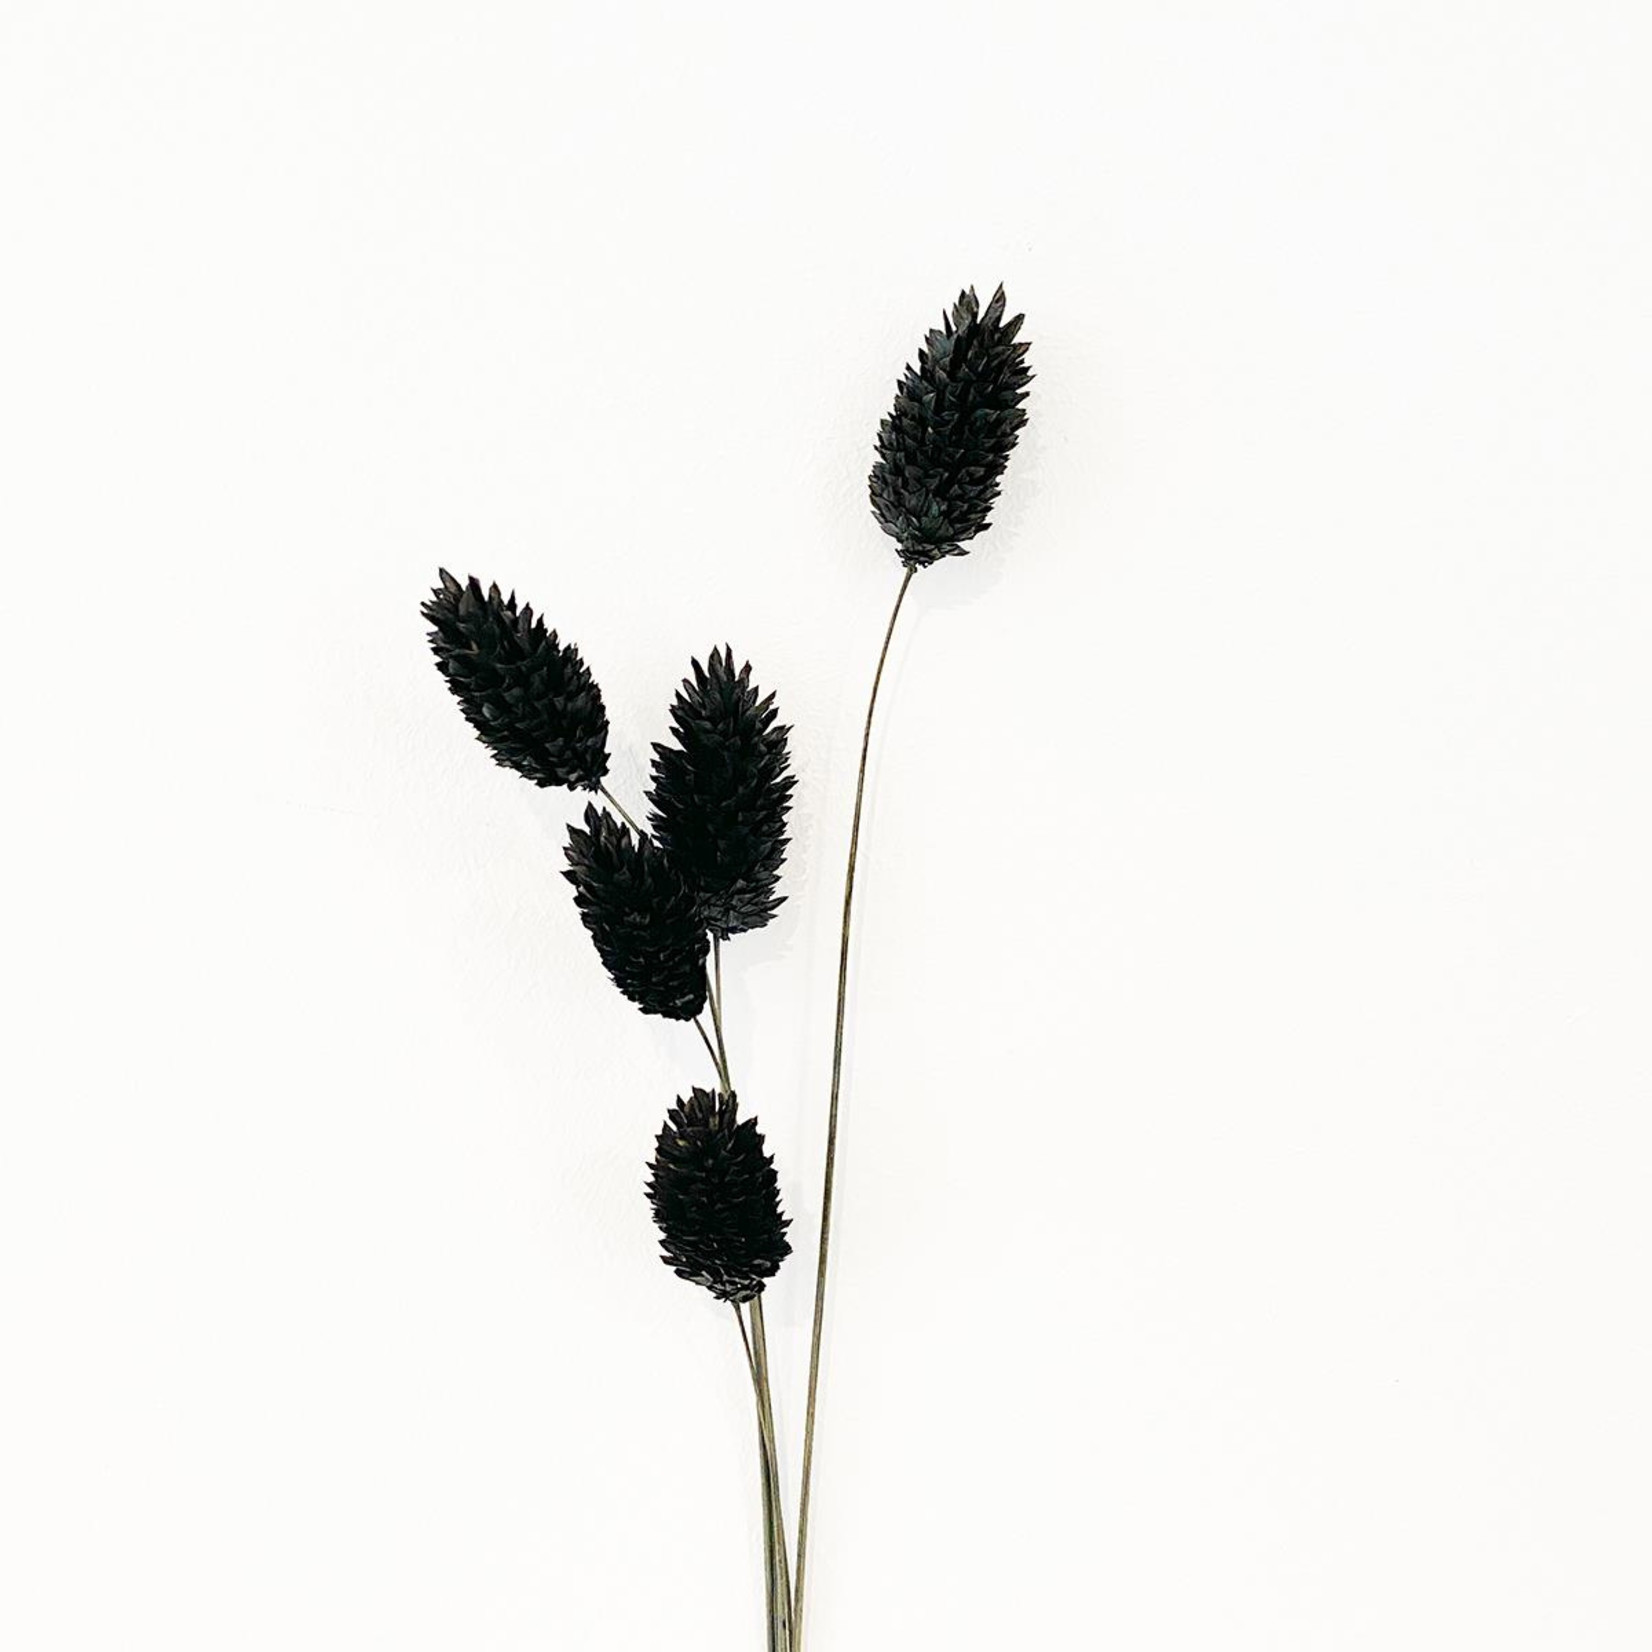 Phalaris schwarz